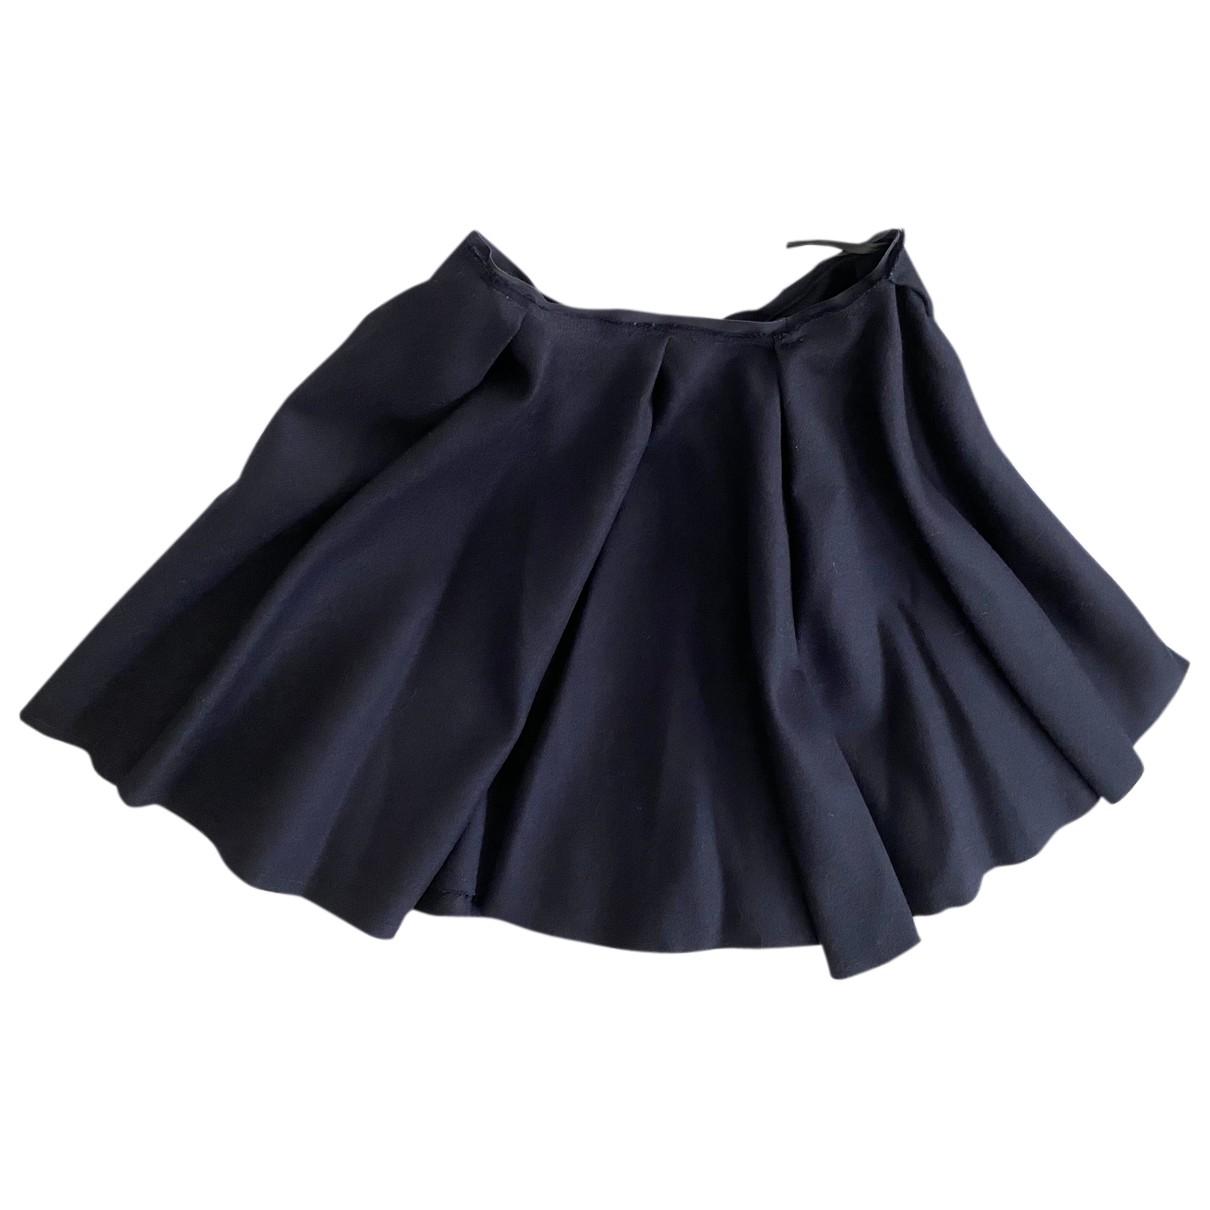 Falda midi de Lana Nina Ricci